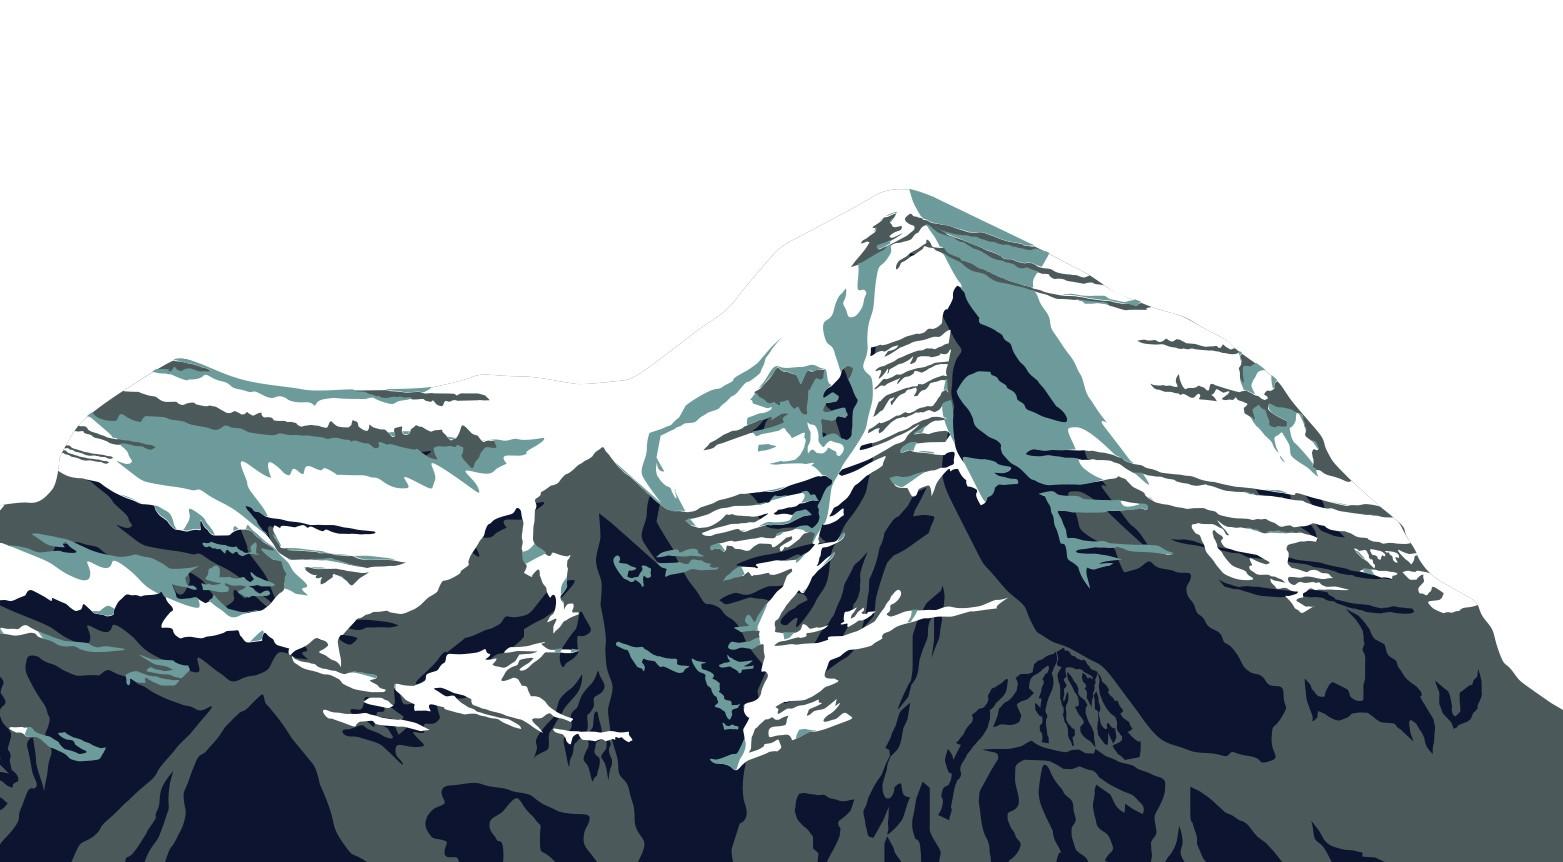 Everest_02